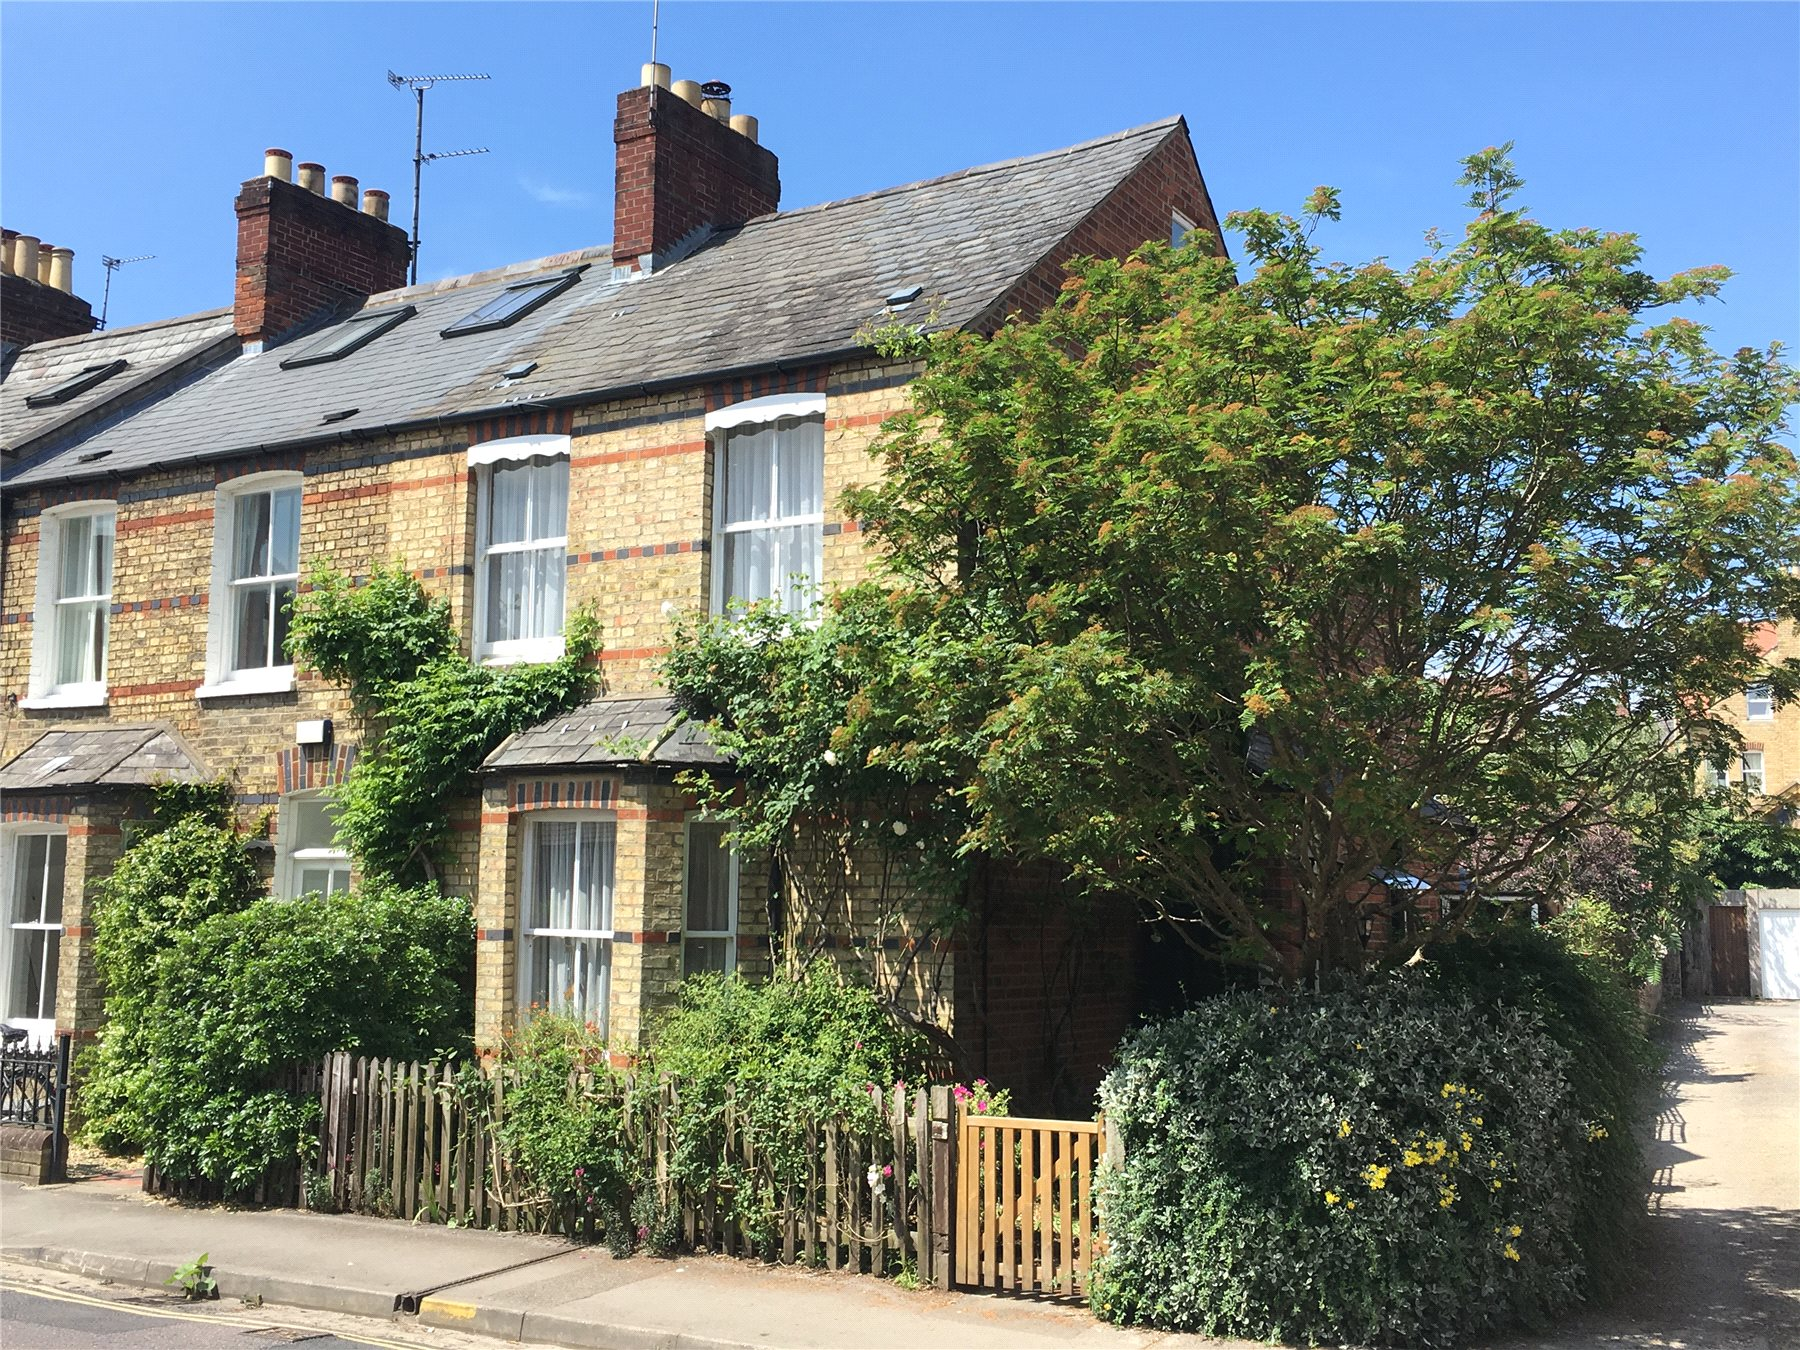 St Bernards Road, Walton Manor, Oxford, OX2